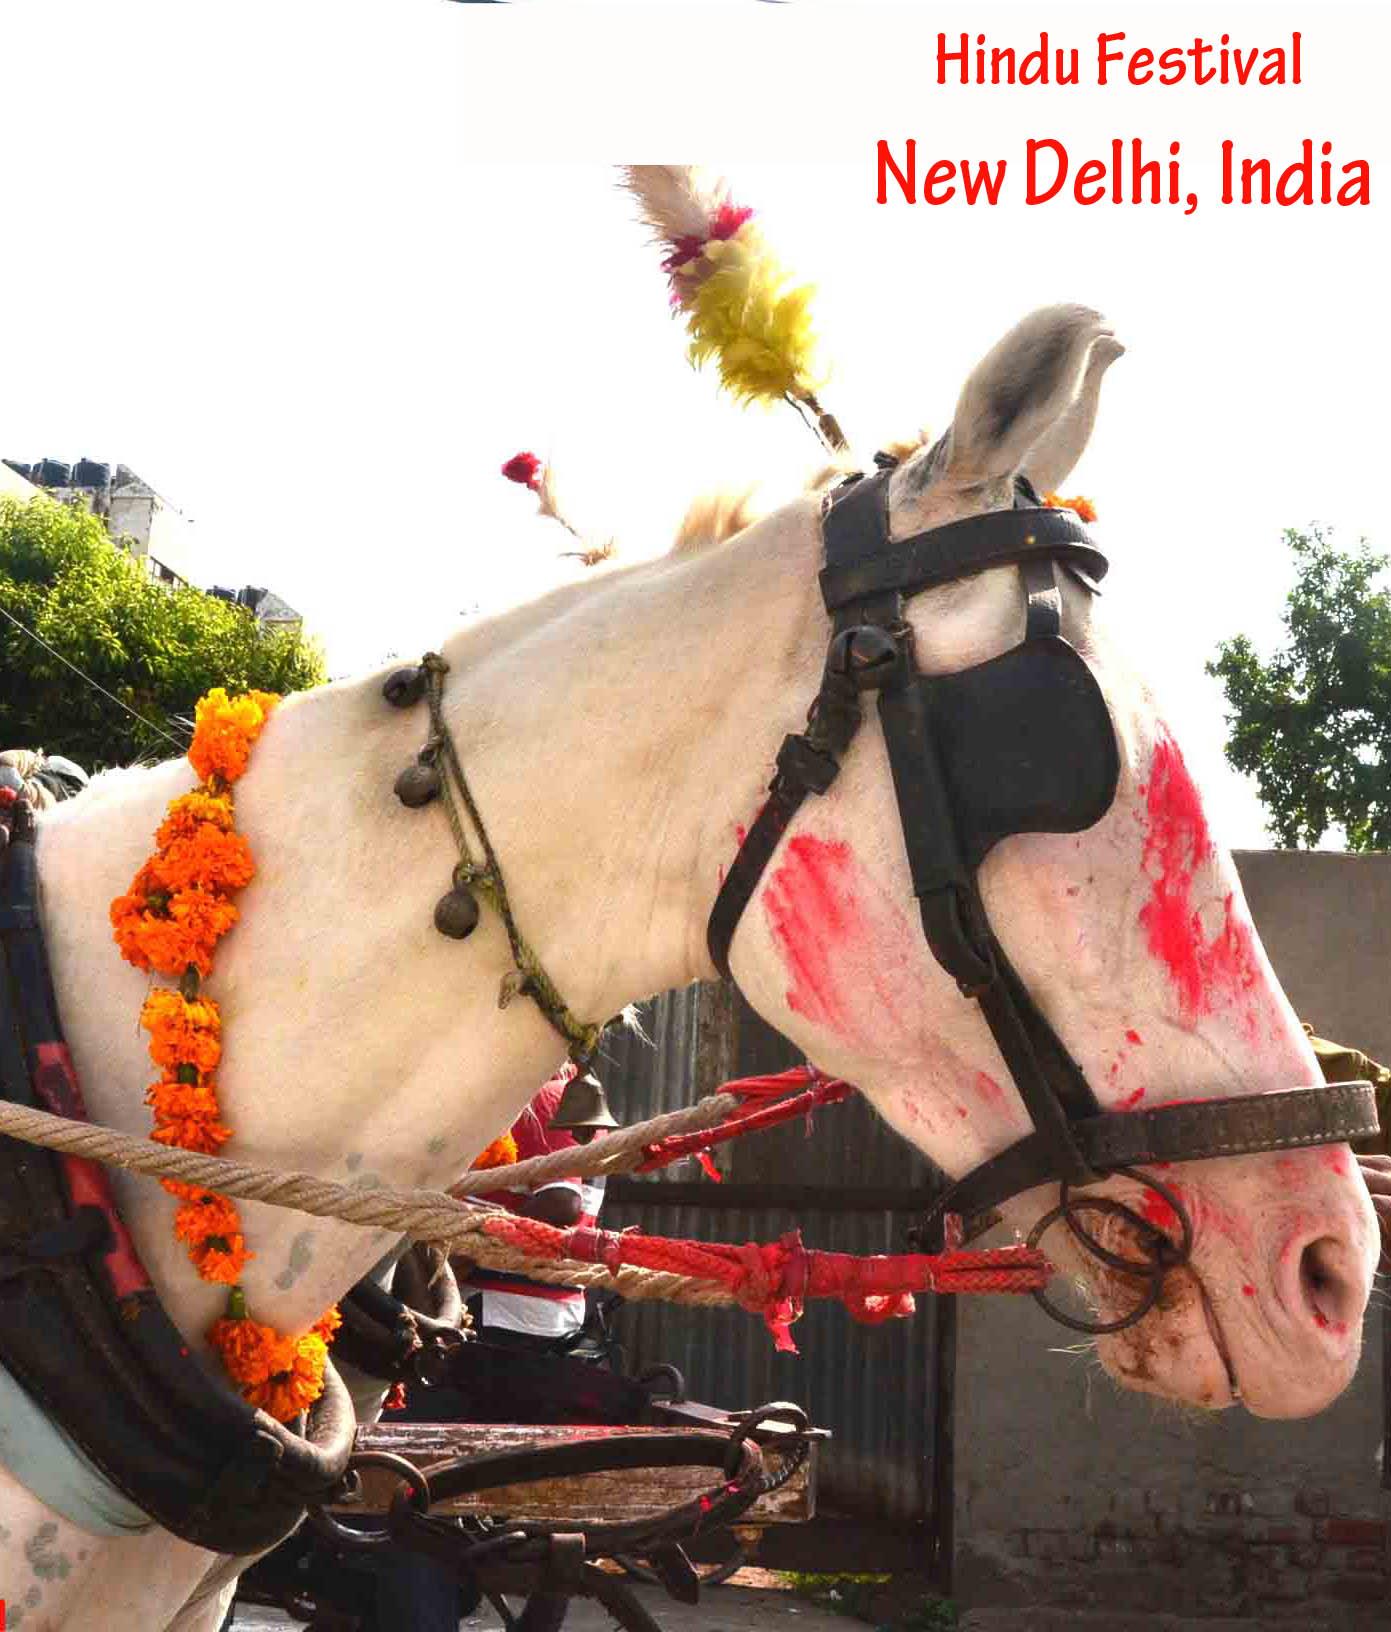 Hindu Festival in New Delhi, India